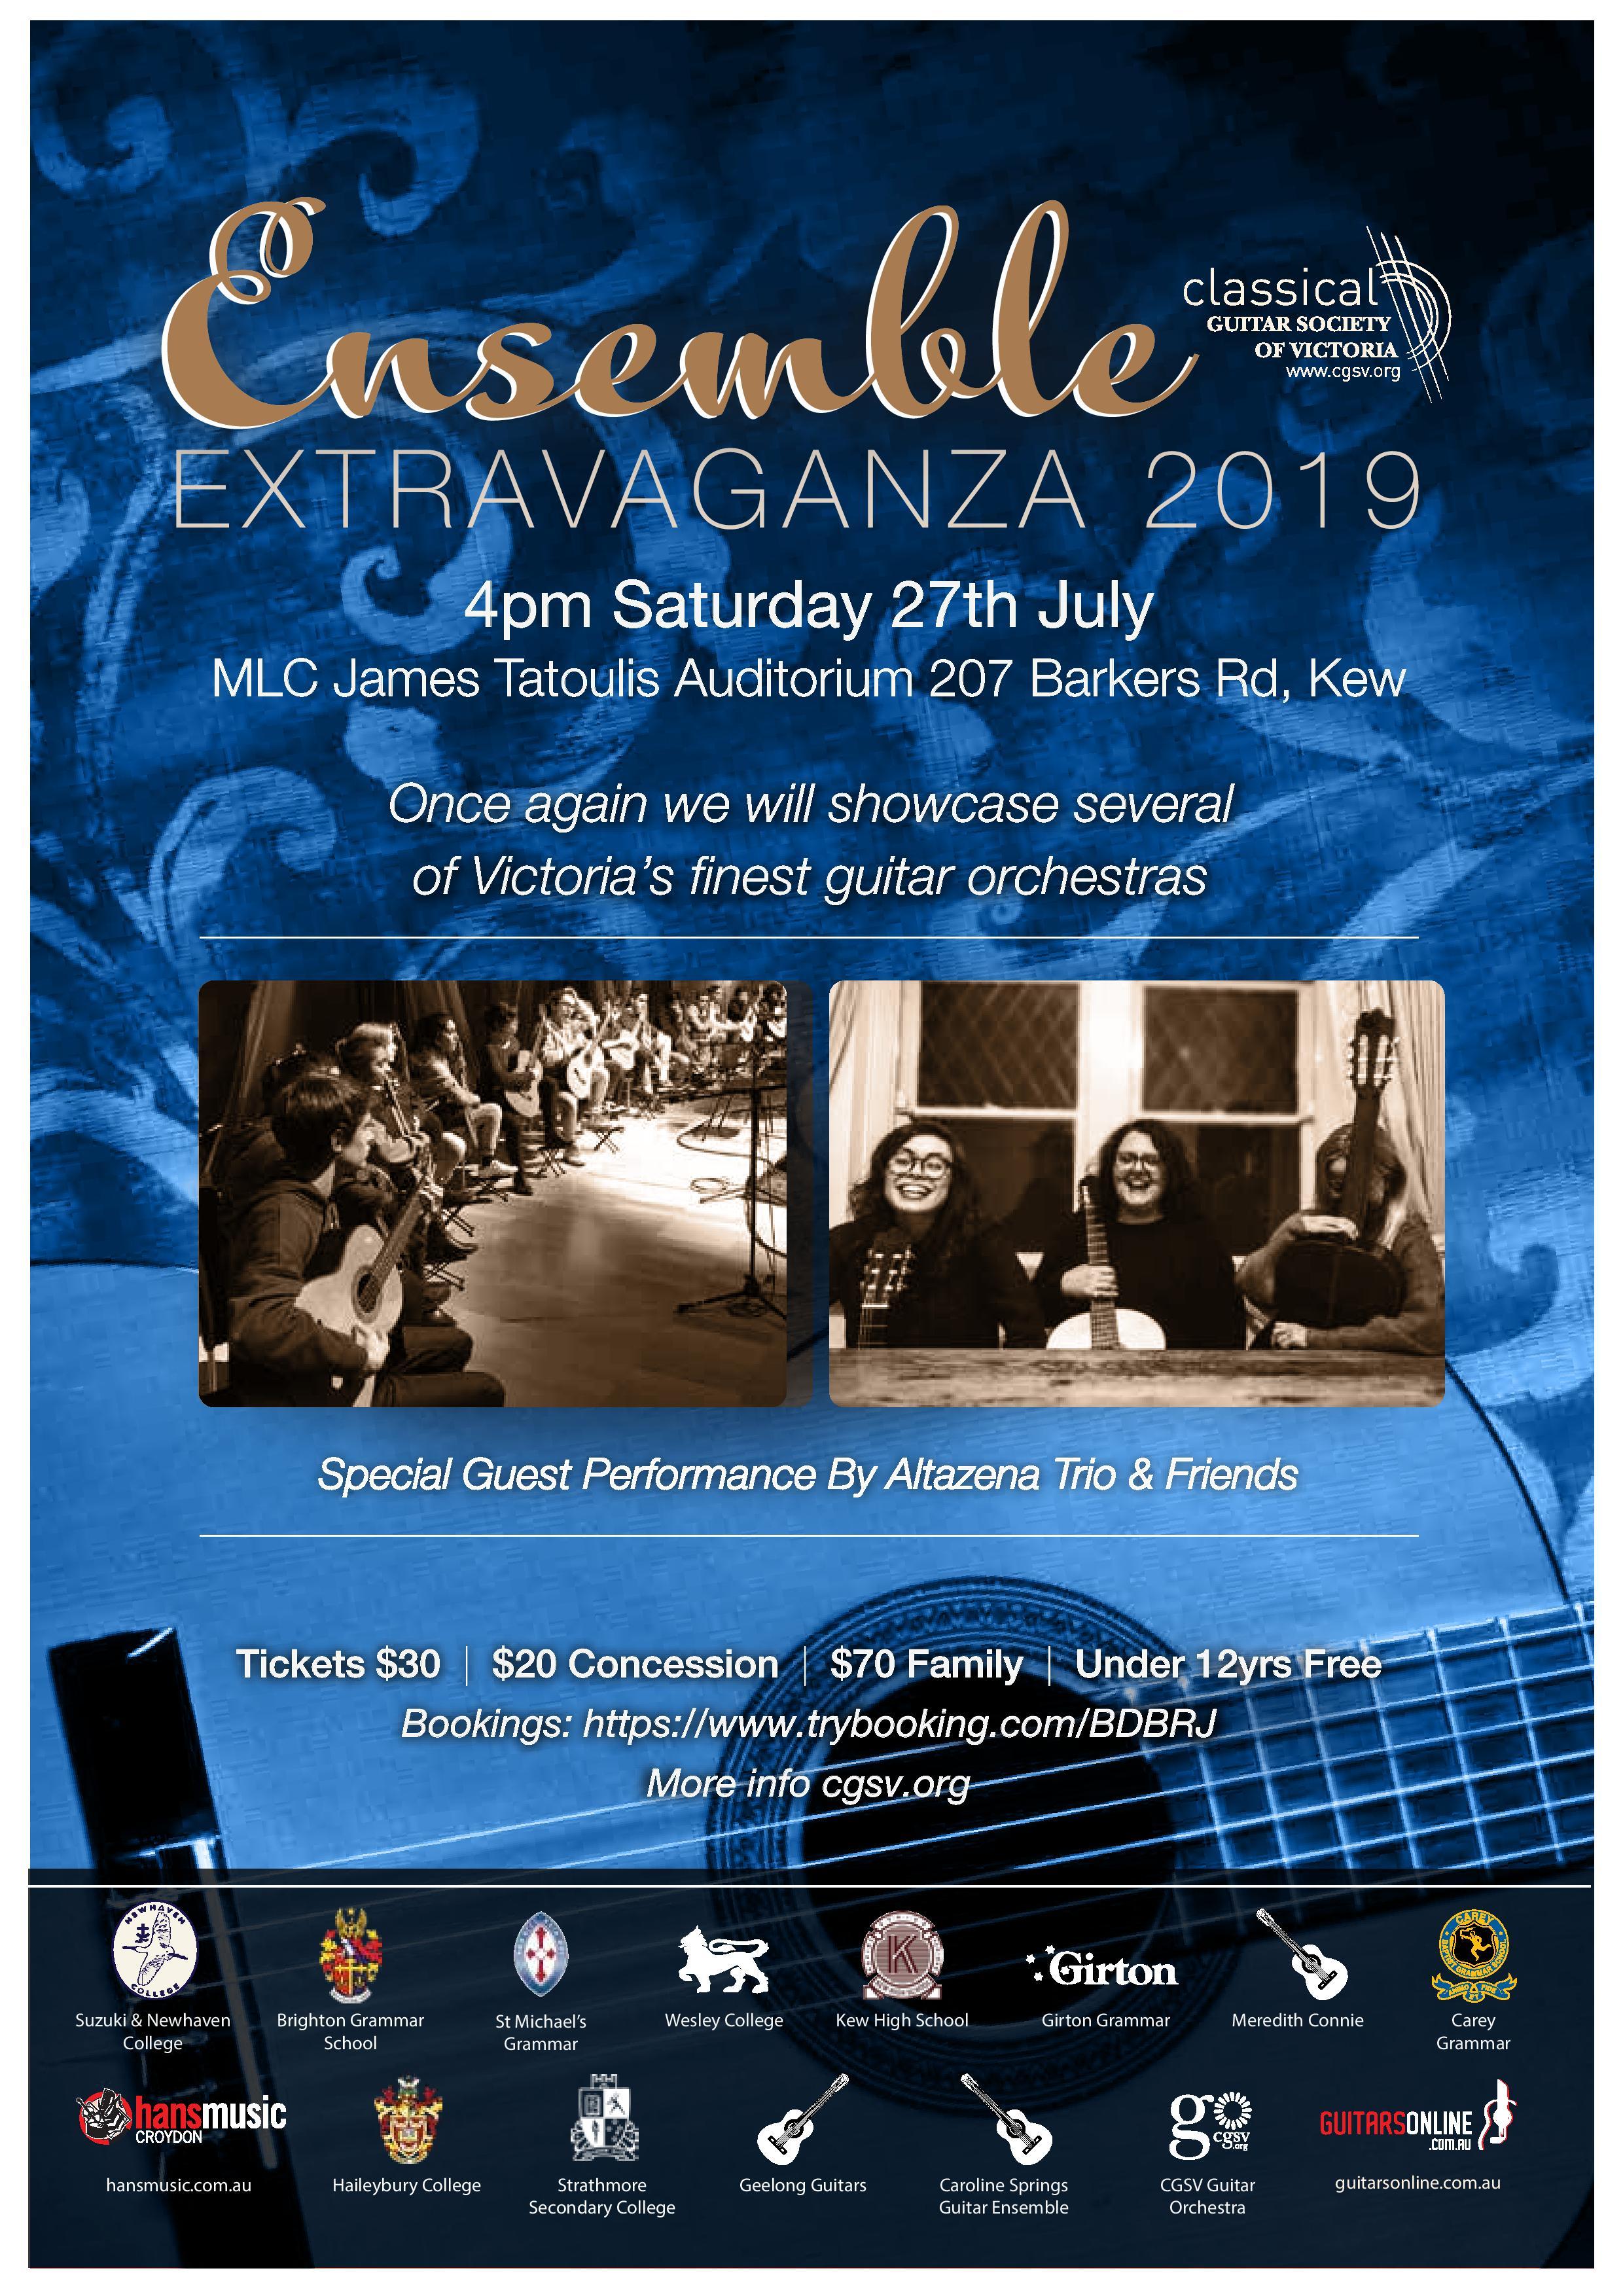 Guitar_Ensemble_Gala_Concert_poster_2019_a4_2-page-001.jpg